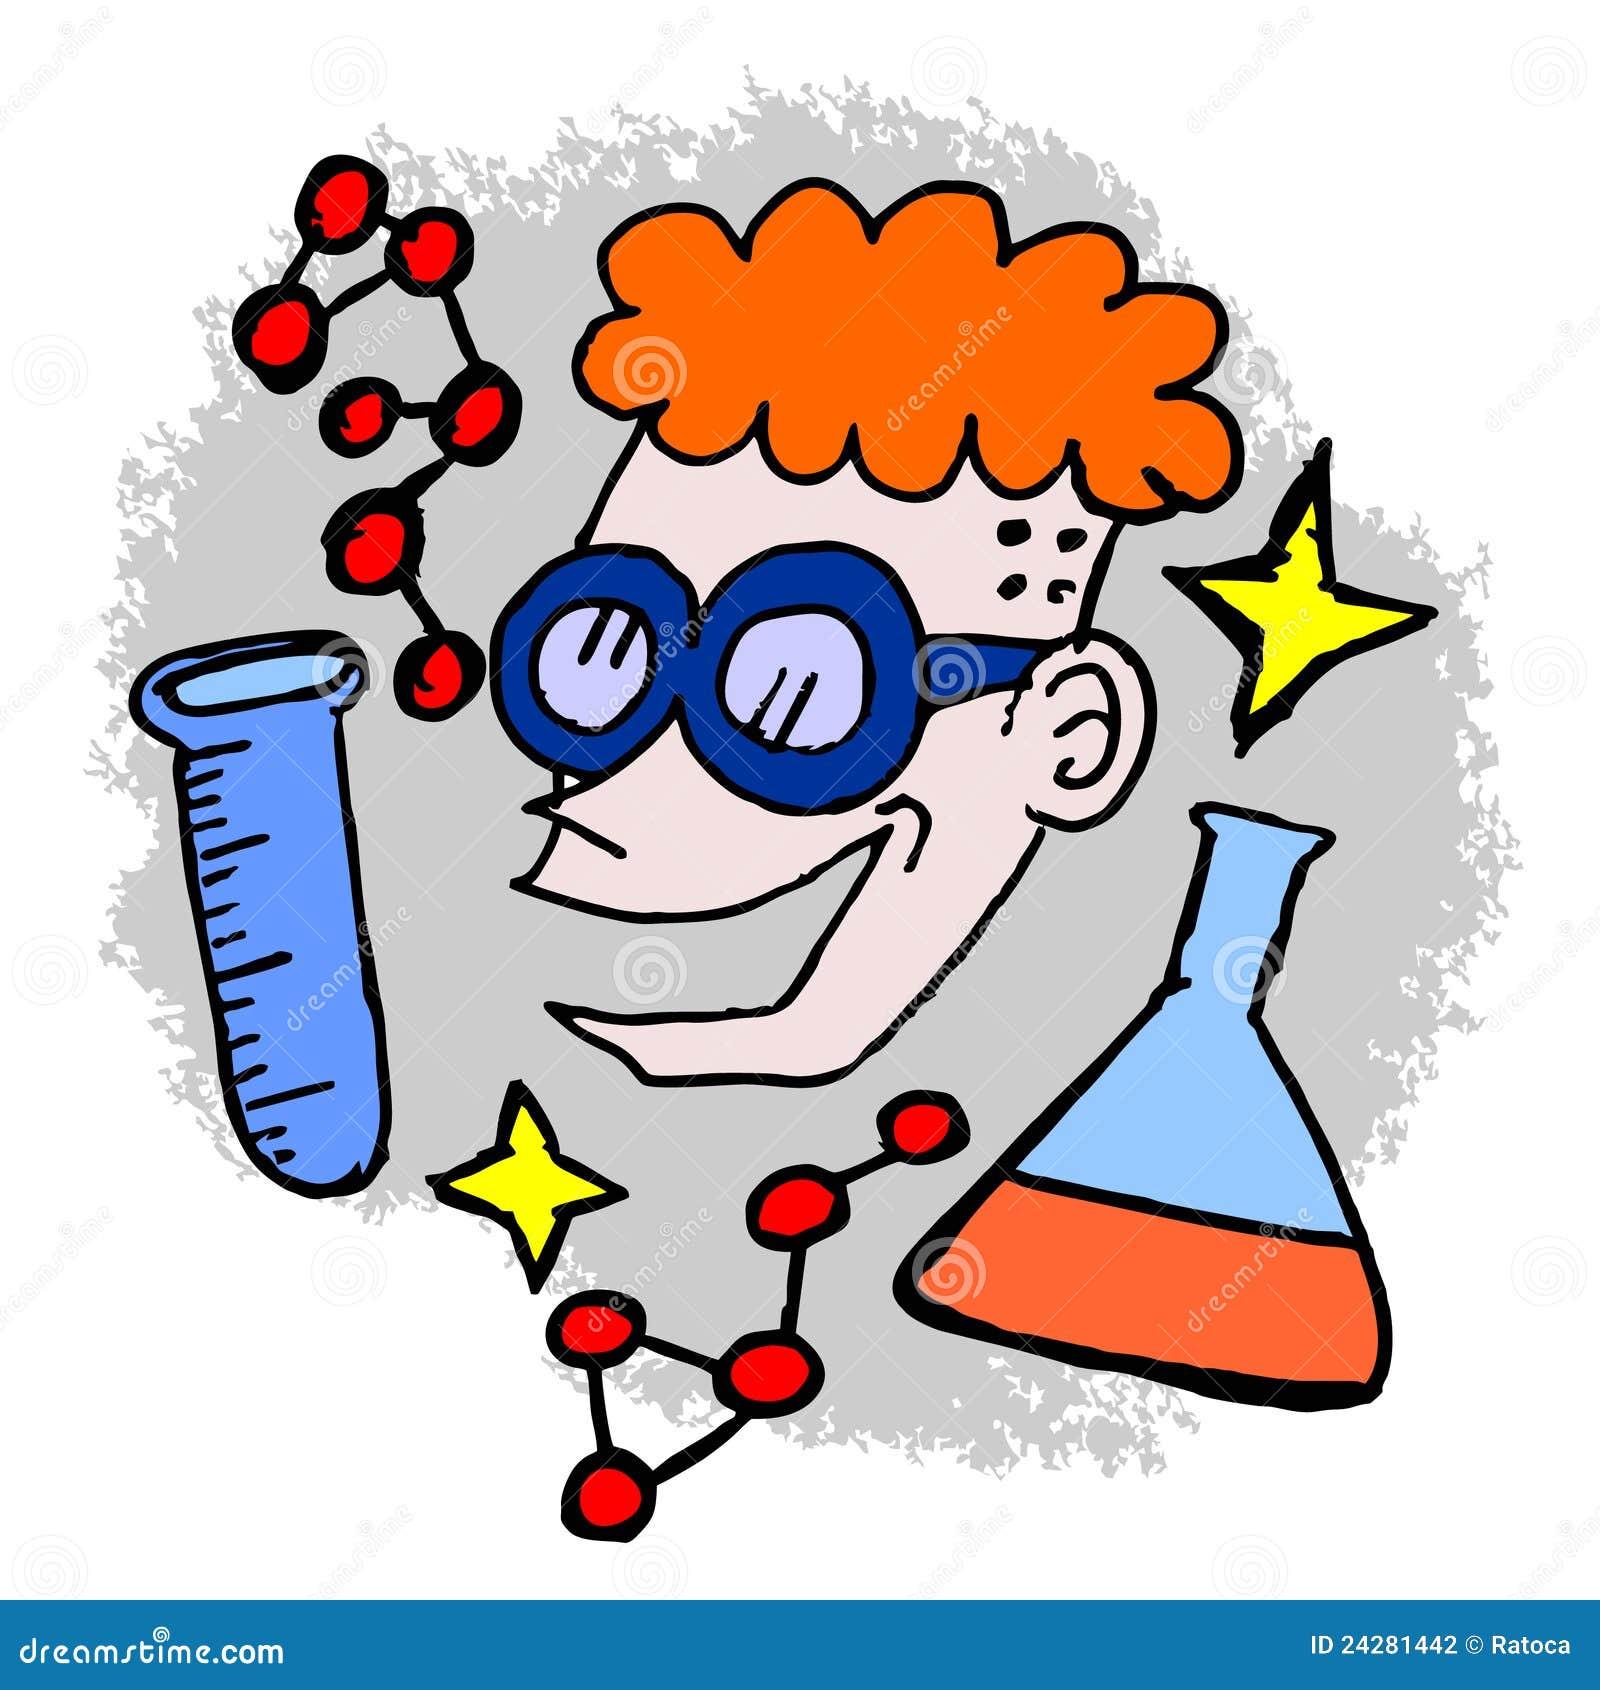 Science Cartoon Stock Photography - Image: 24281442